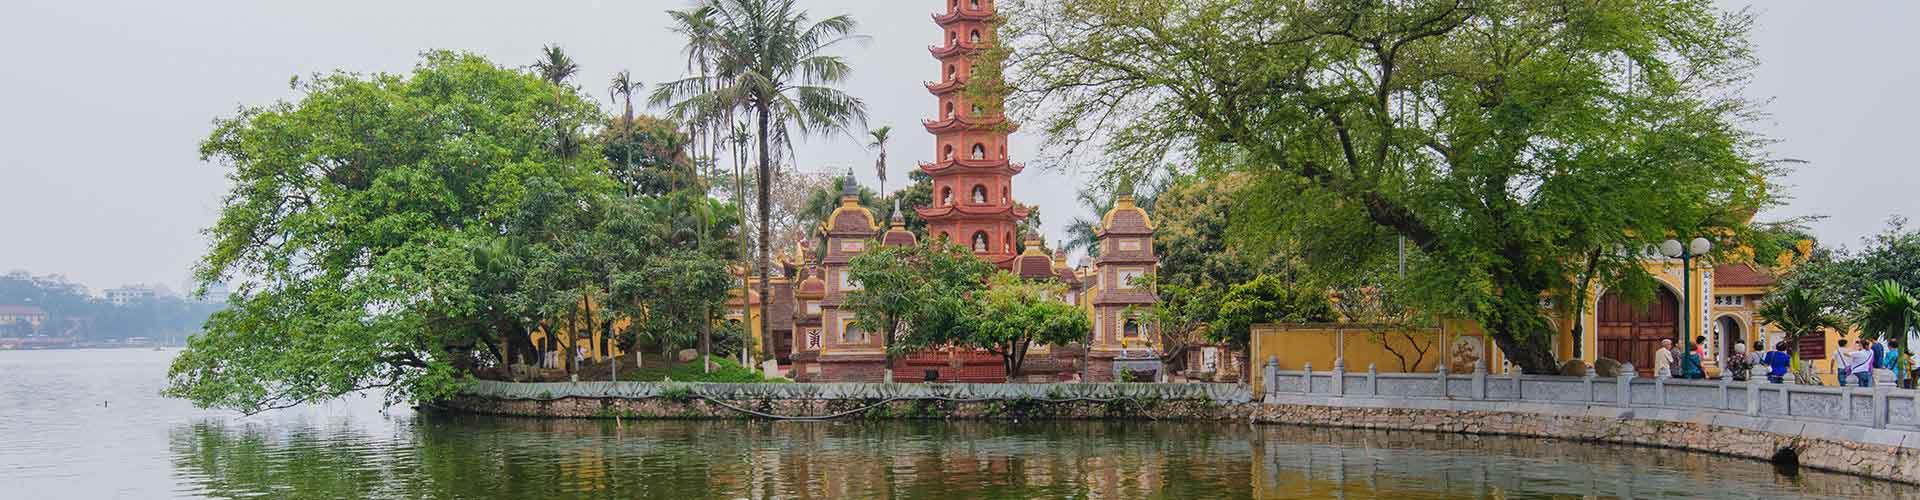 Hanoi - Hostelů v Hanoi. Mapy pro Hanoi, fotky a recenze pro každý hostel v Hanoi.